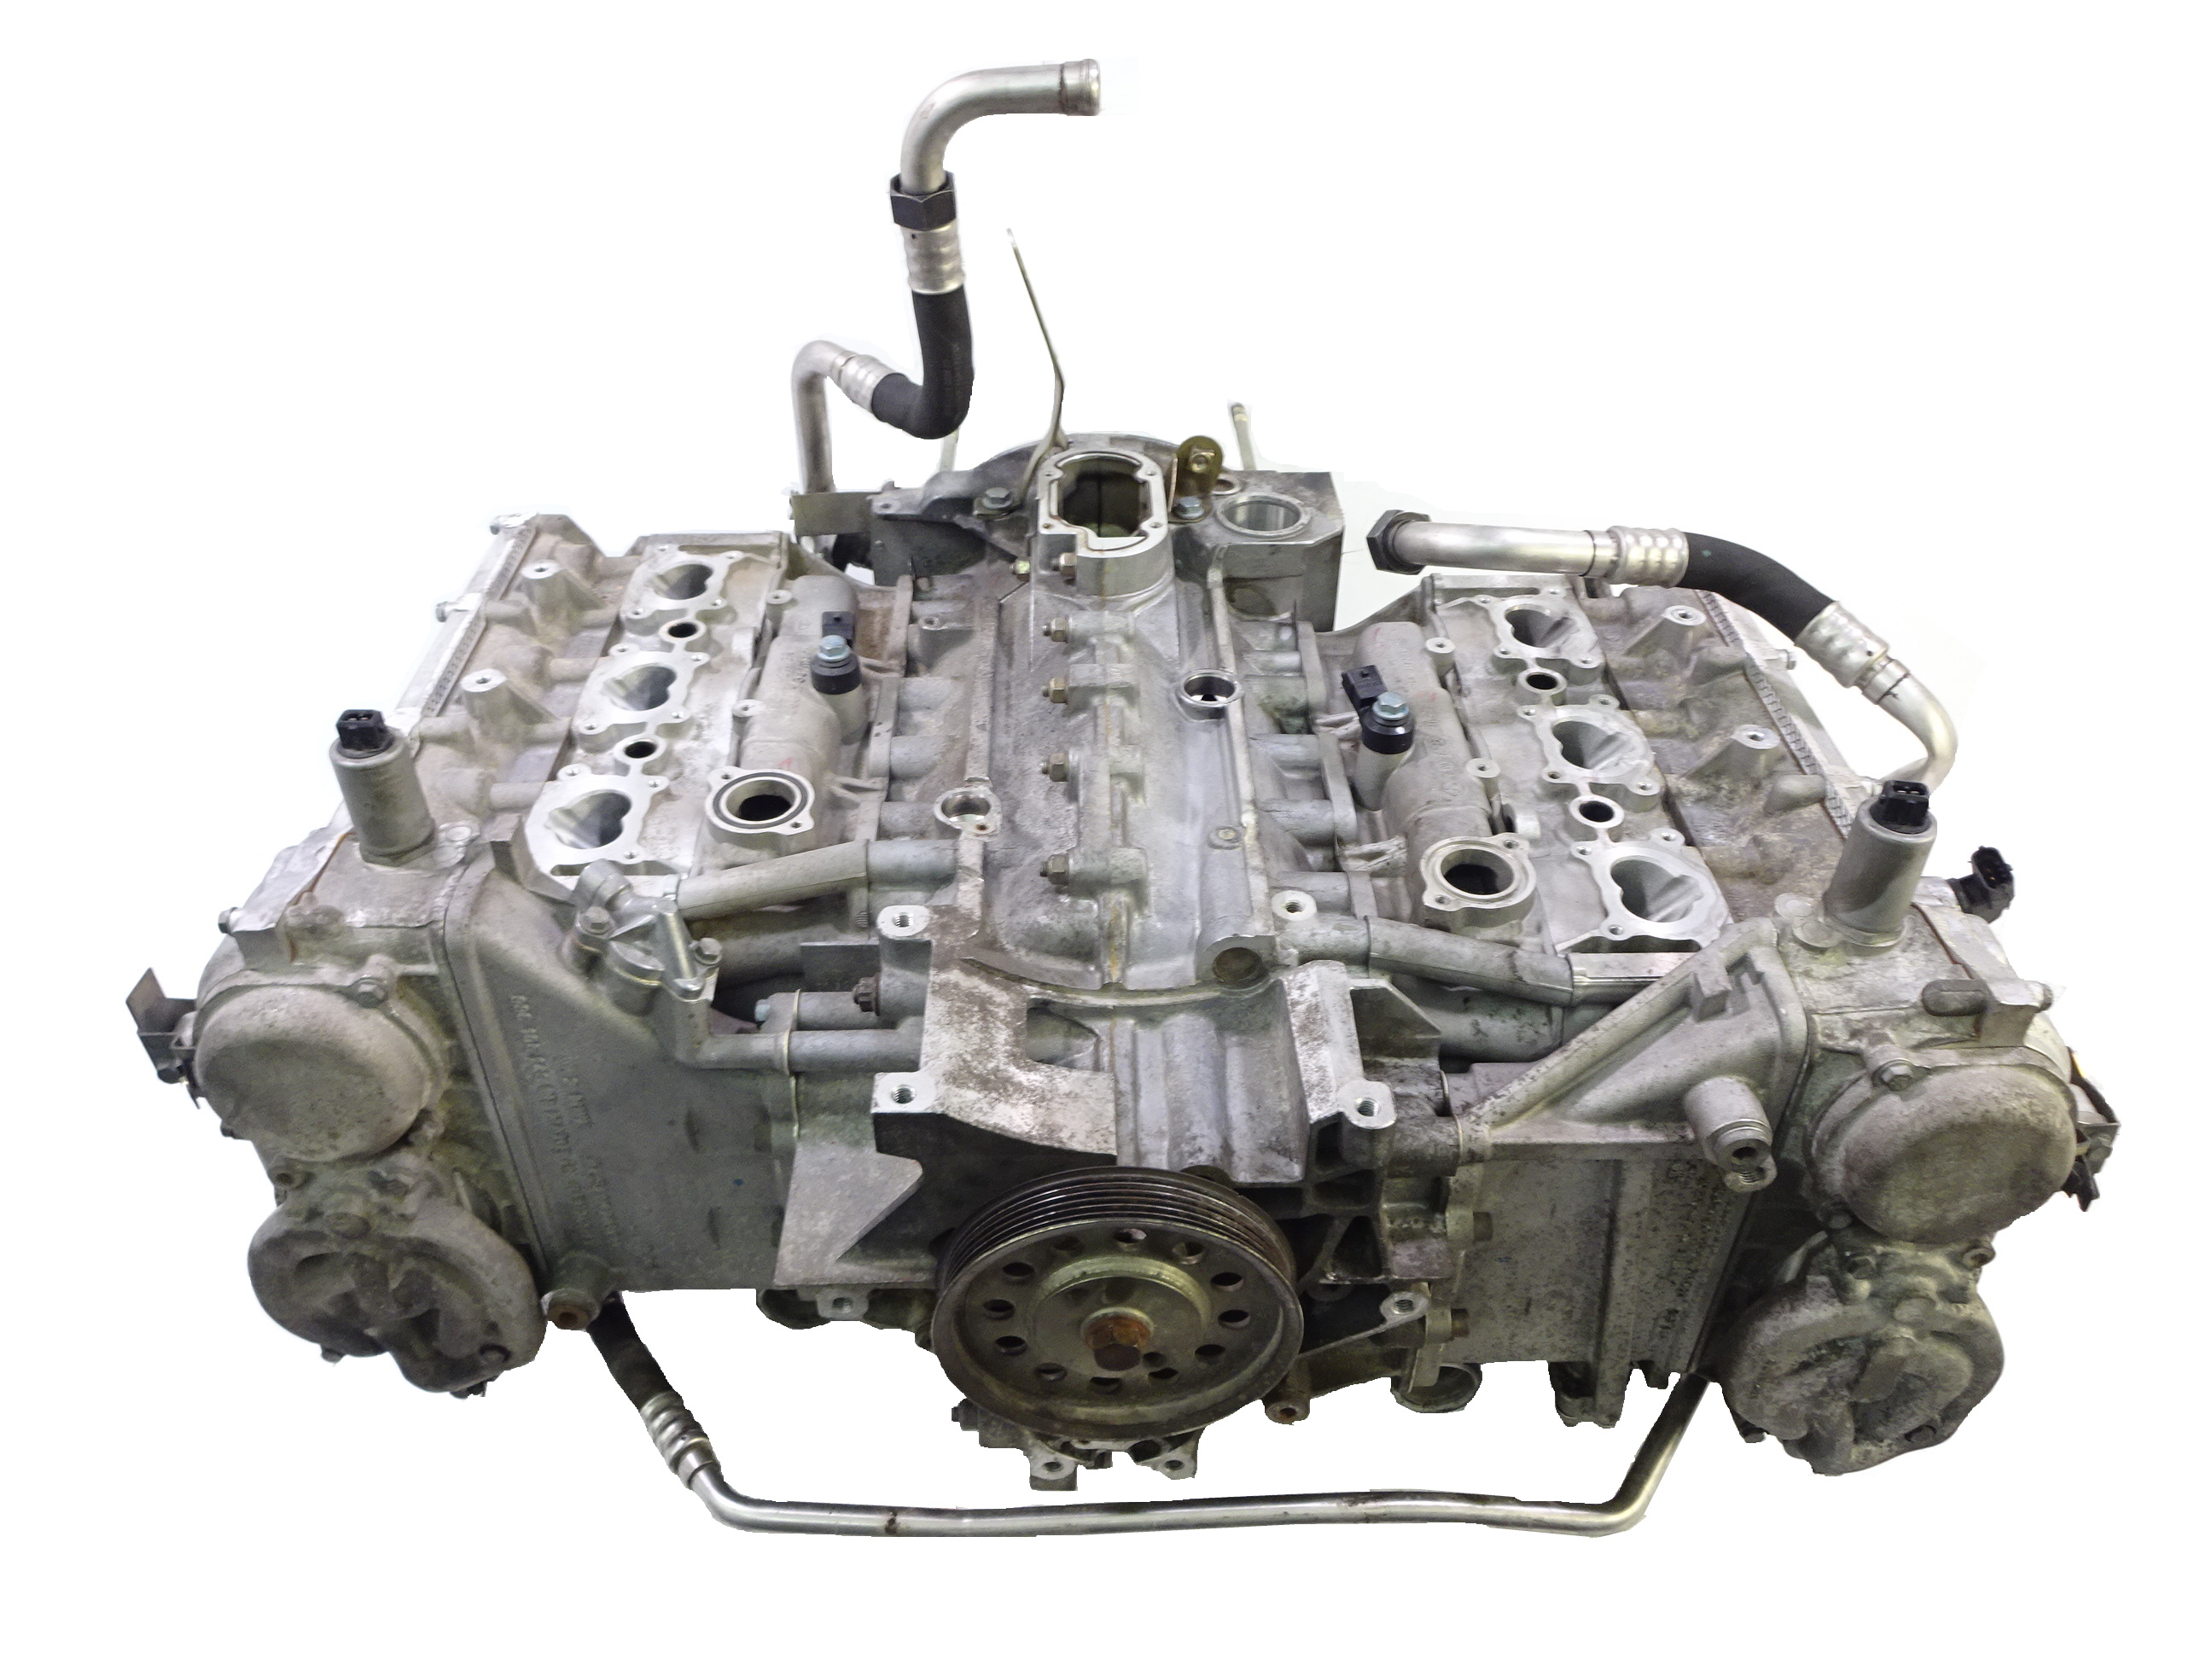 Motor 2004 Porsche 3,6 Turbo 4 M96.70 M96 420 PS